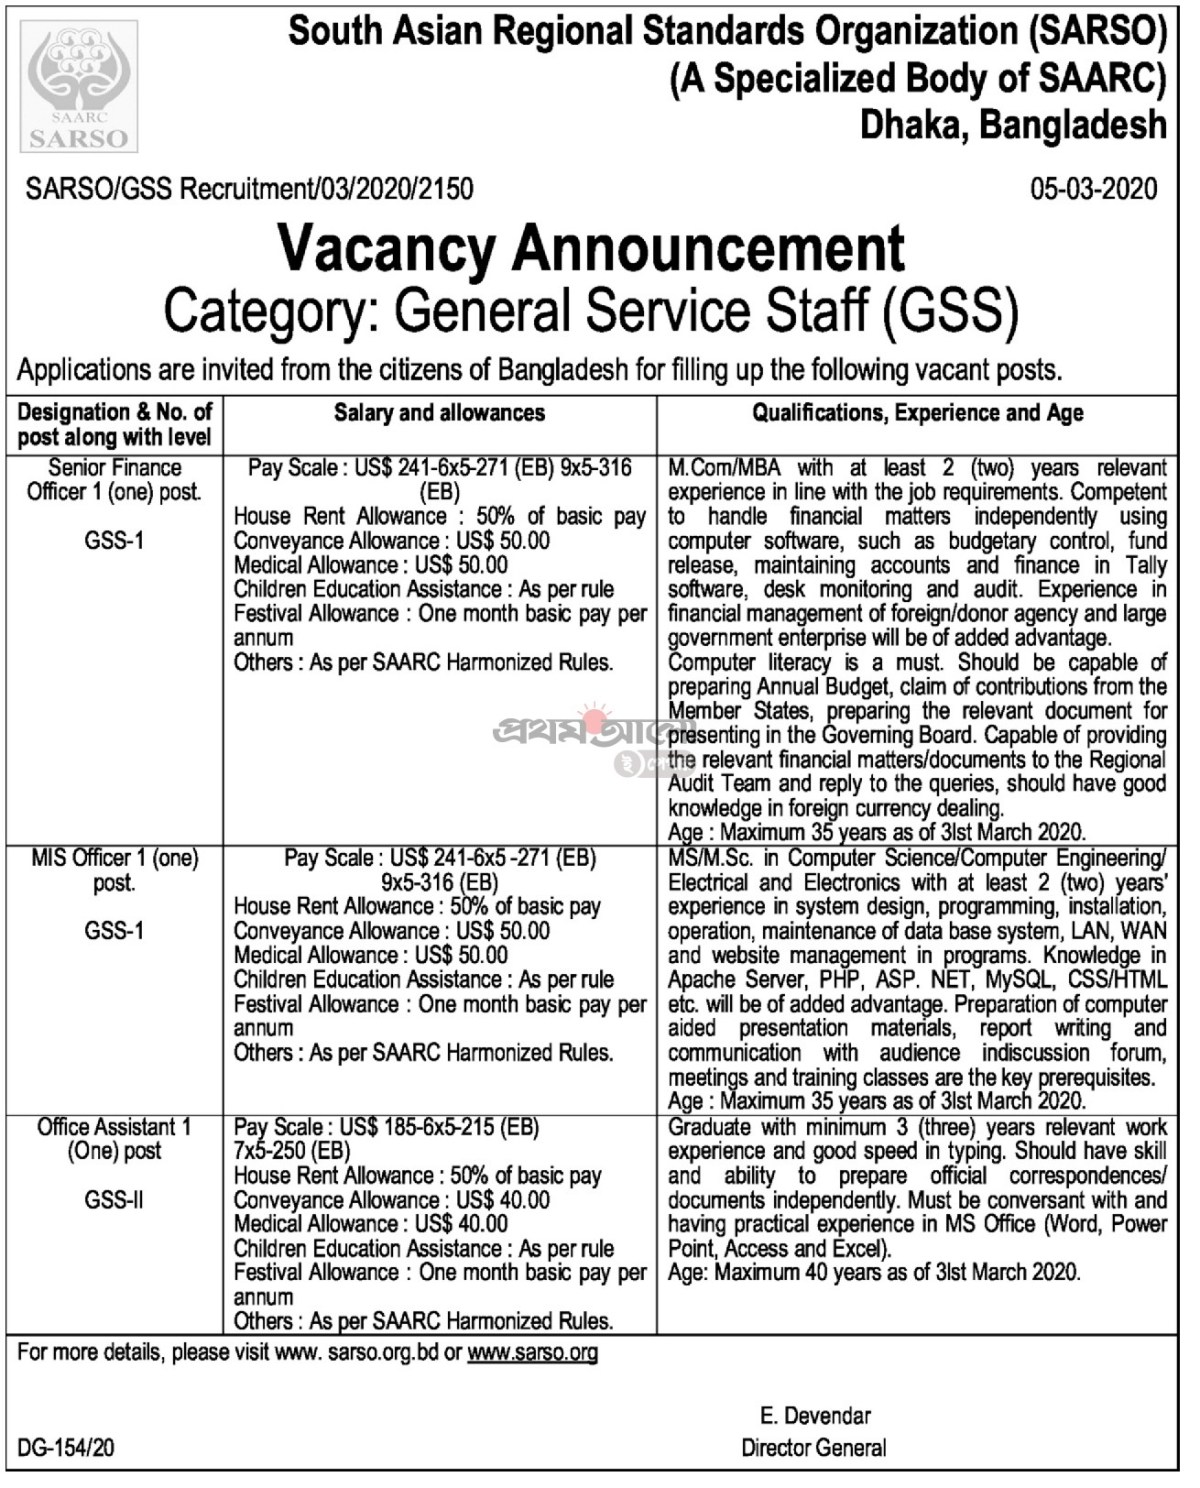 South Asian Regional Standards Organization Job Circular 2020